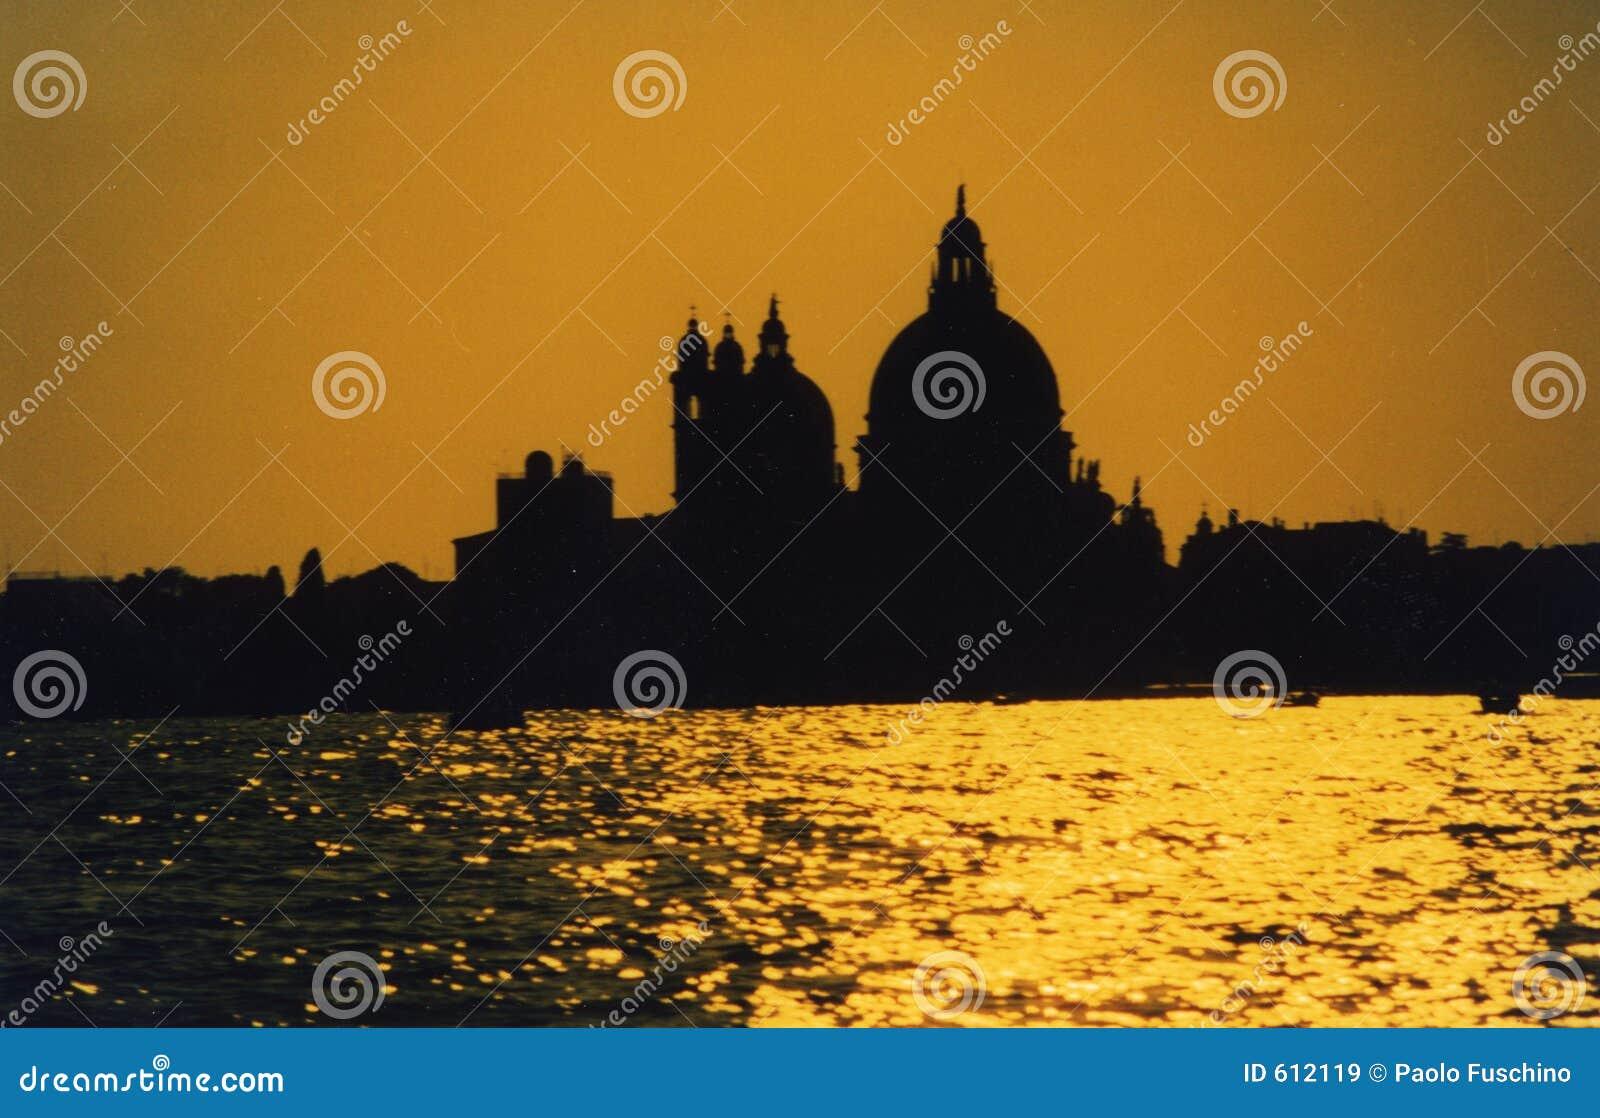 Venezia - Tramonto